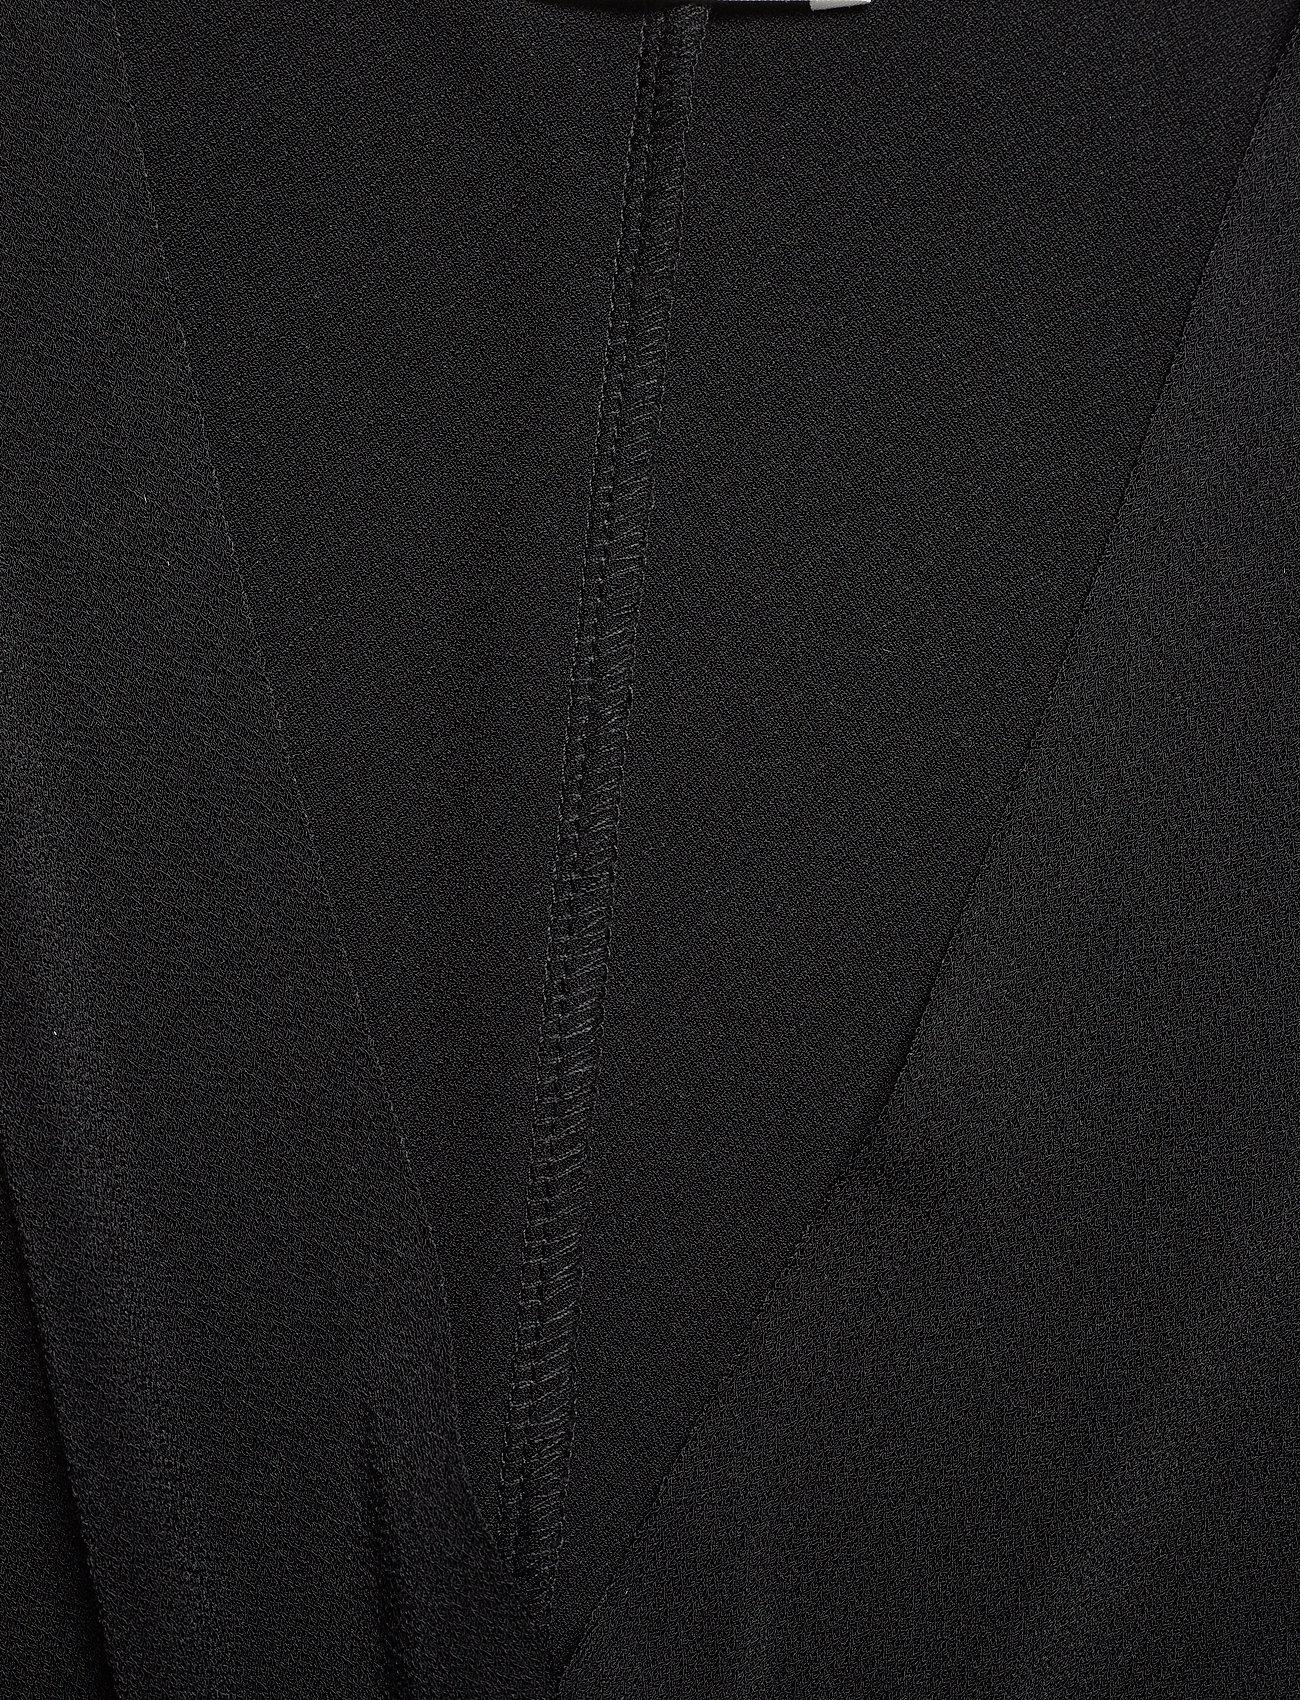 Brizza (Black) (799.50 kr) - By Malene Birger